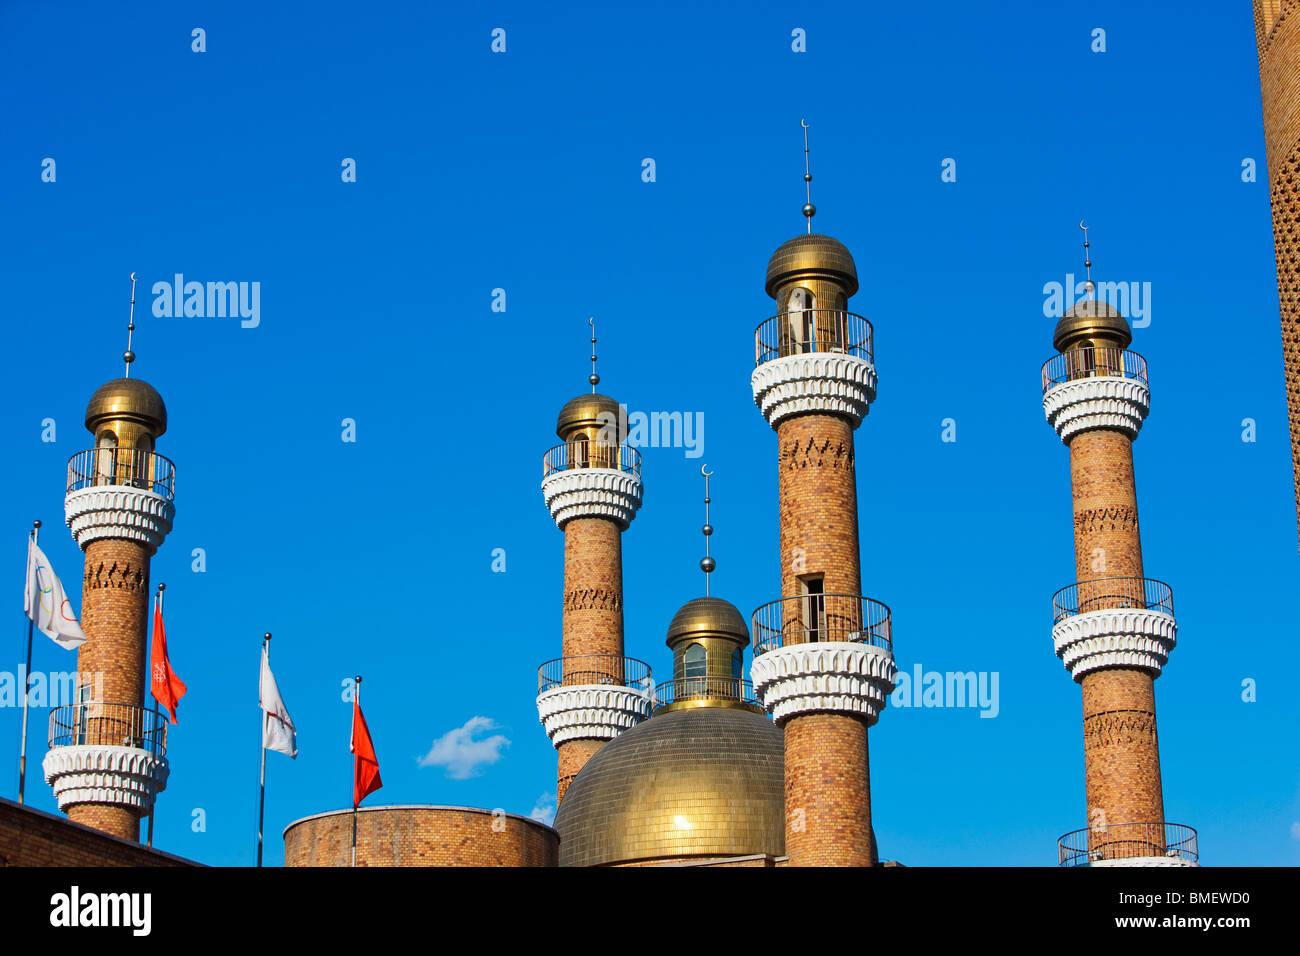 Folk Arts Museum, International Grand Bazaar, Urumqi, Xinjiang Uyghur Regione autonoma, Cina Immagini Stock